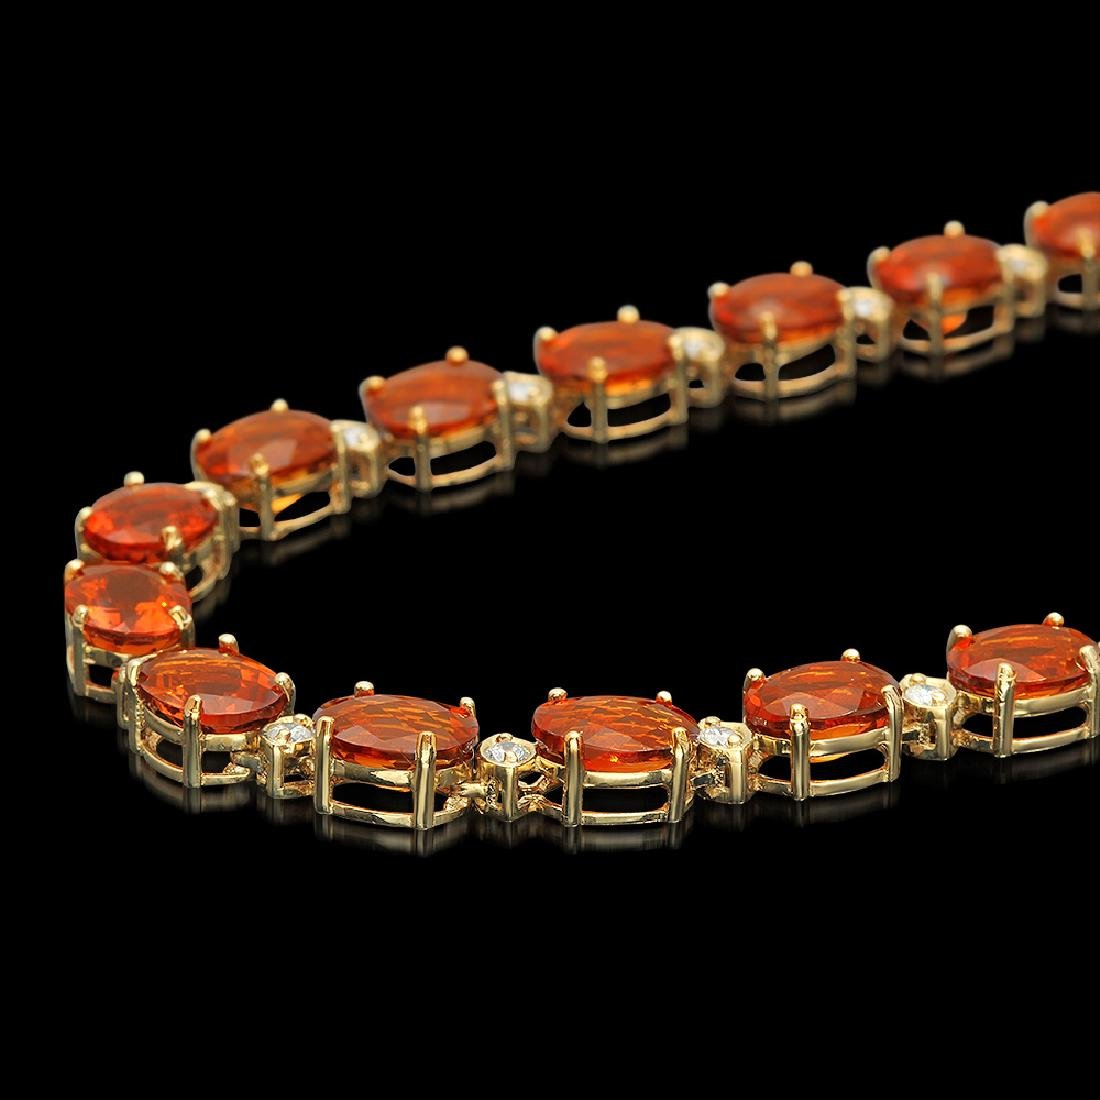 14K Gold 60.15ct Citrine Diamond Necklace - 2